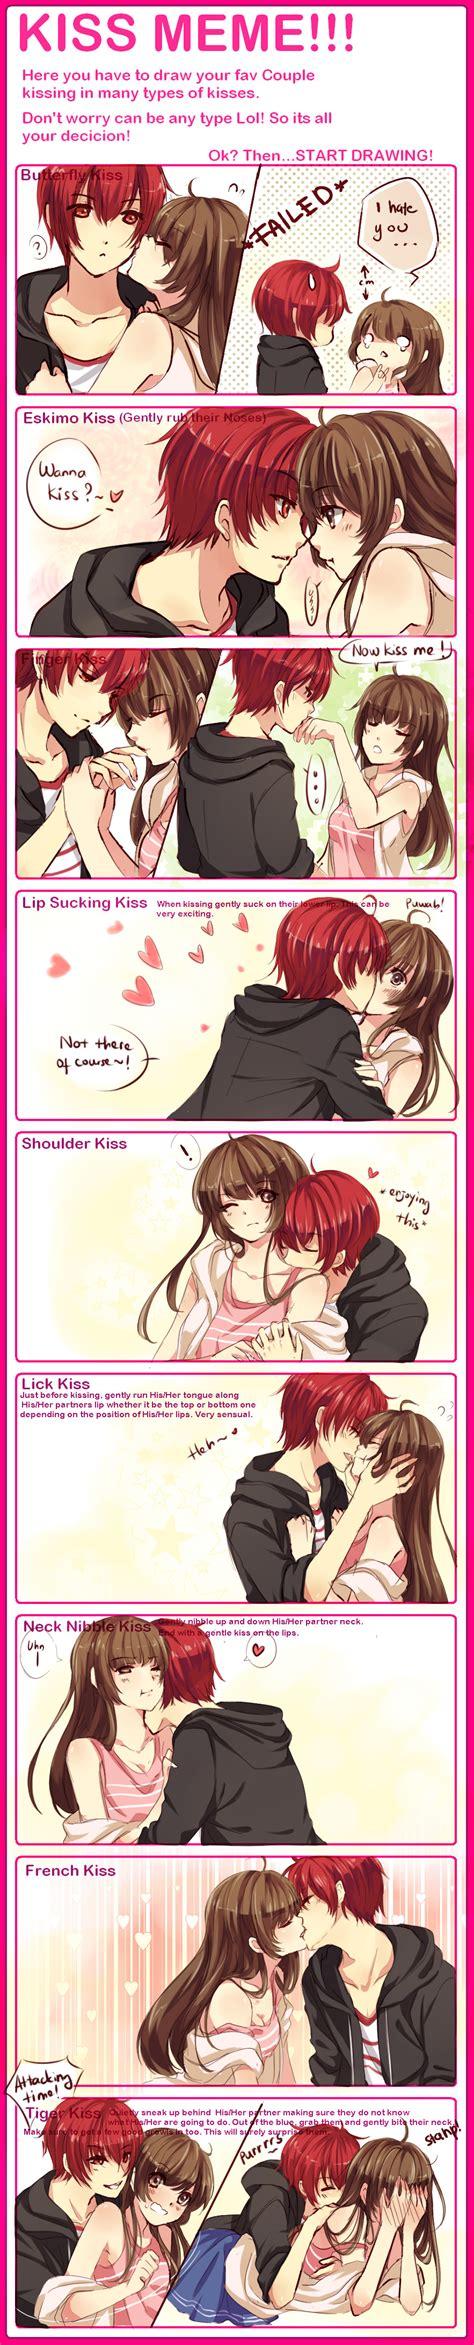 Kiss Memes - kiss meme with waifuuuu by zenithomocha on deviantart